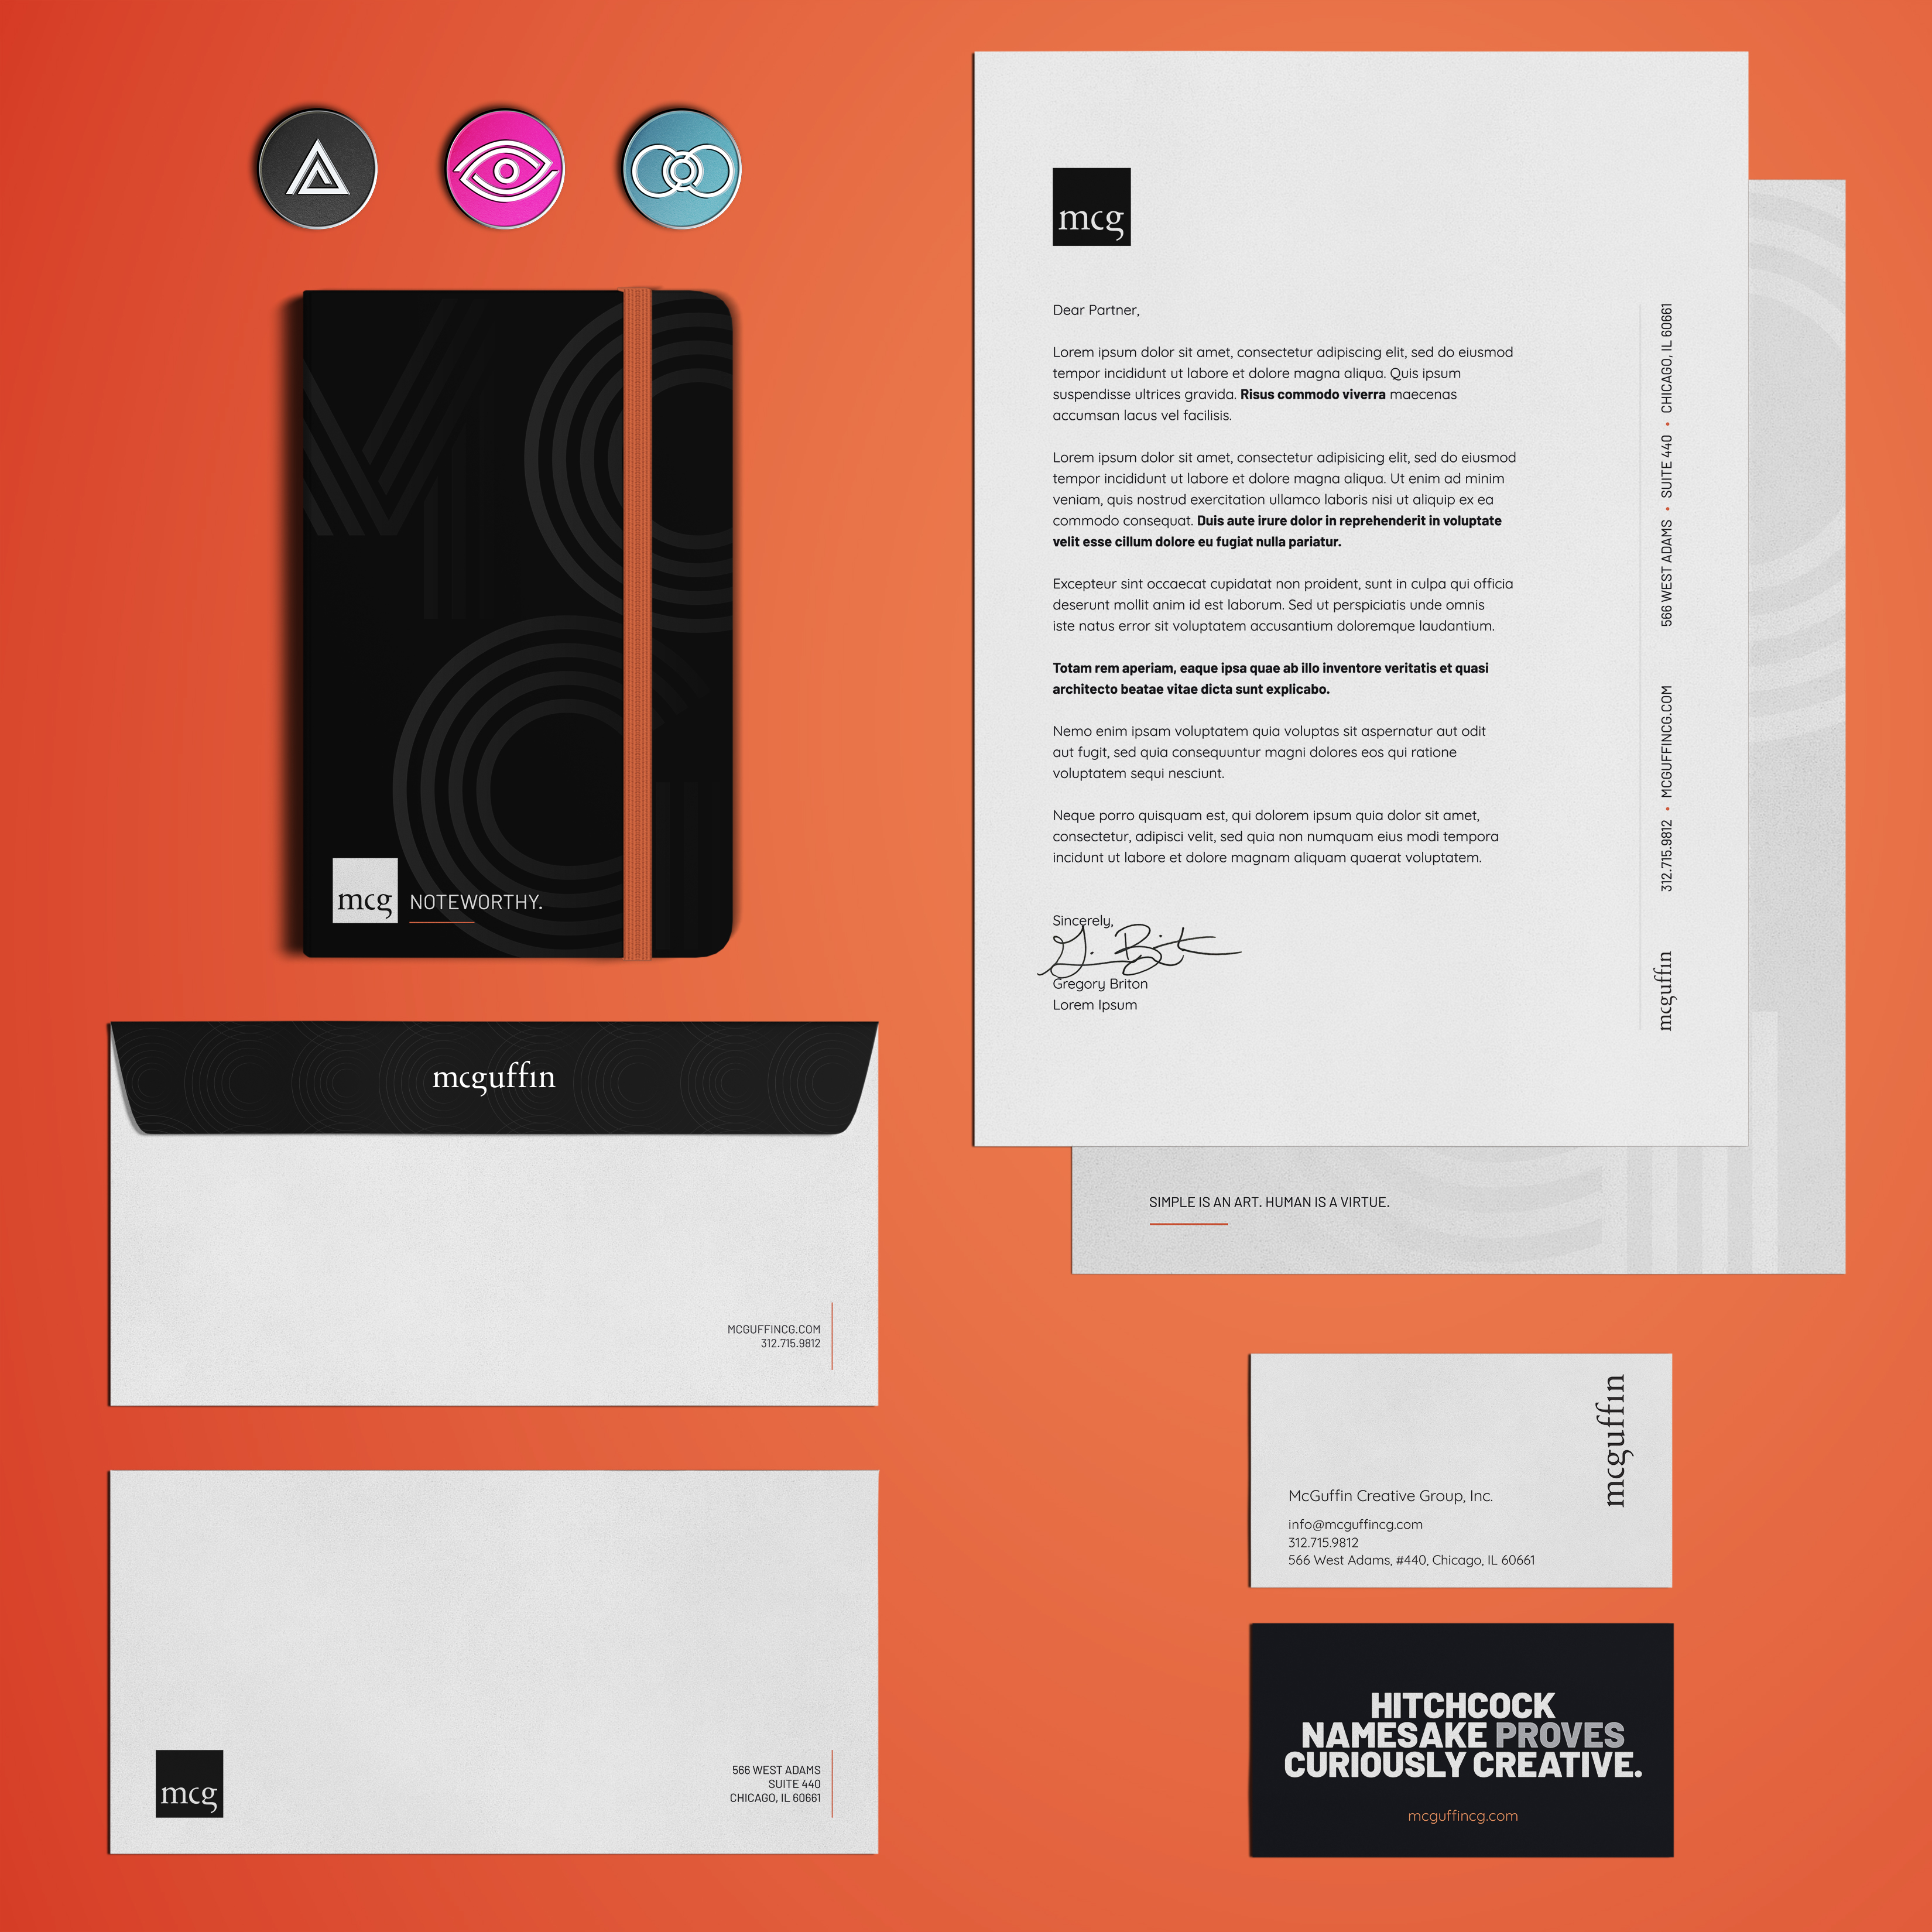 McGuffin Creative Group Rebrand